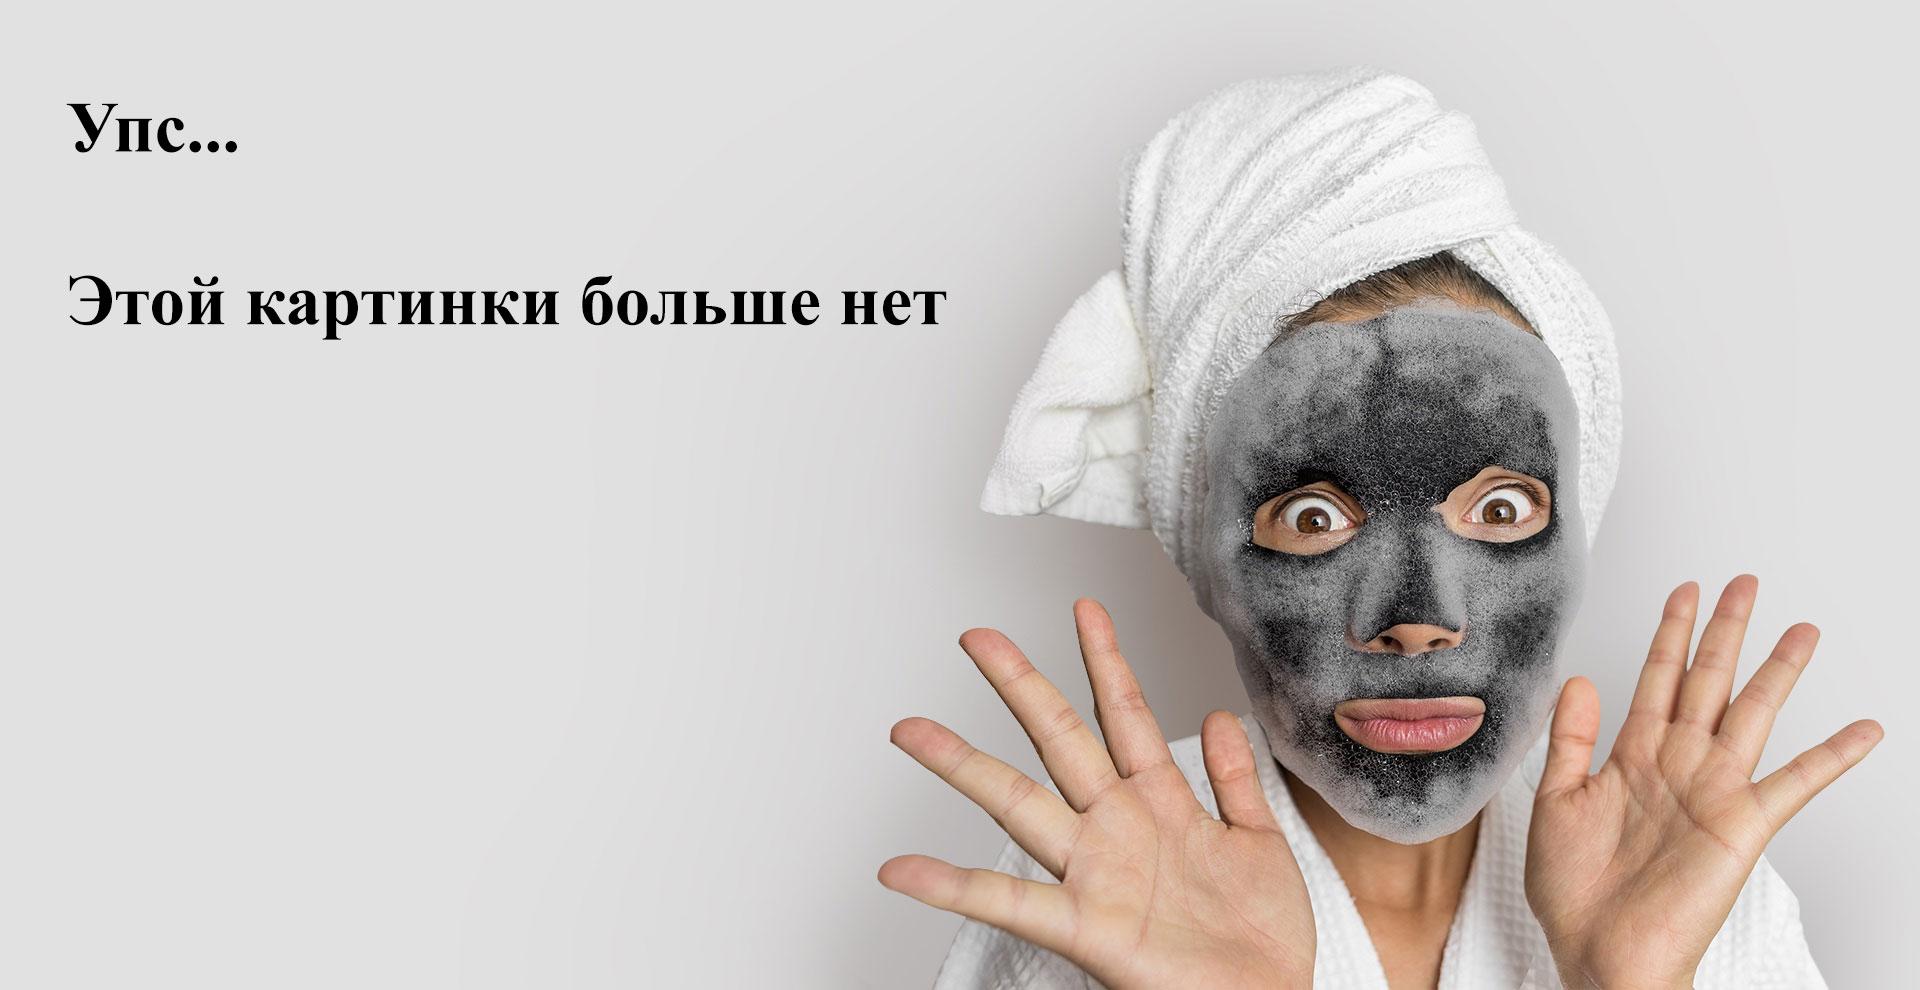 Patrisa Nail, Гель-лак «Элегия» №521, Хаос